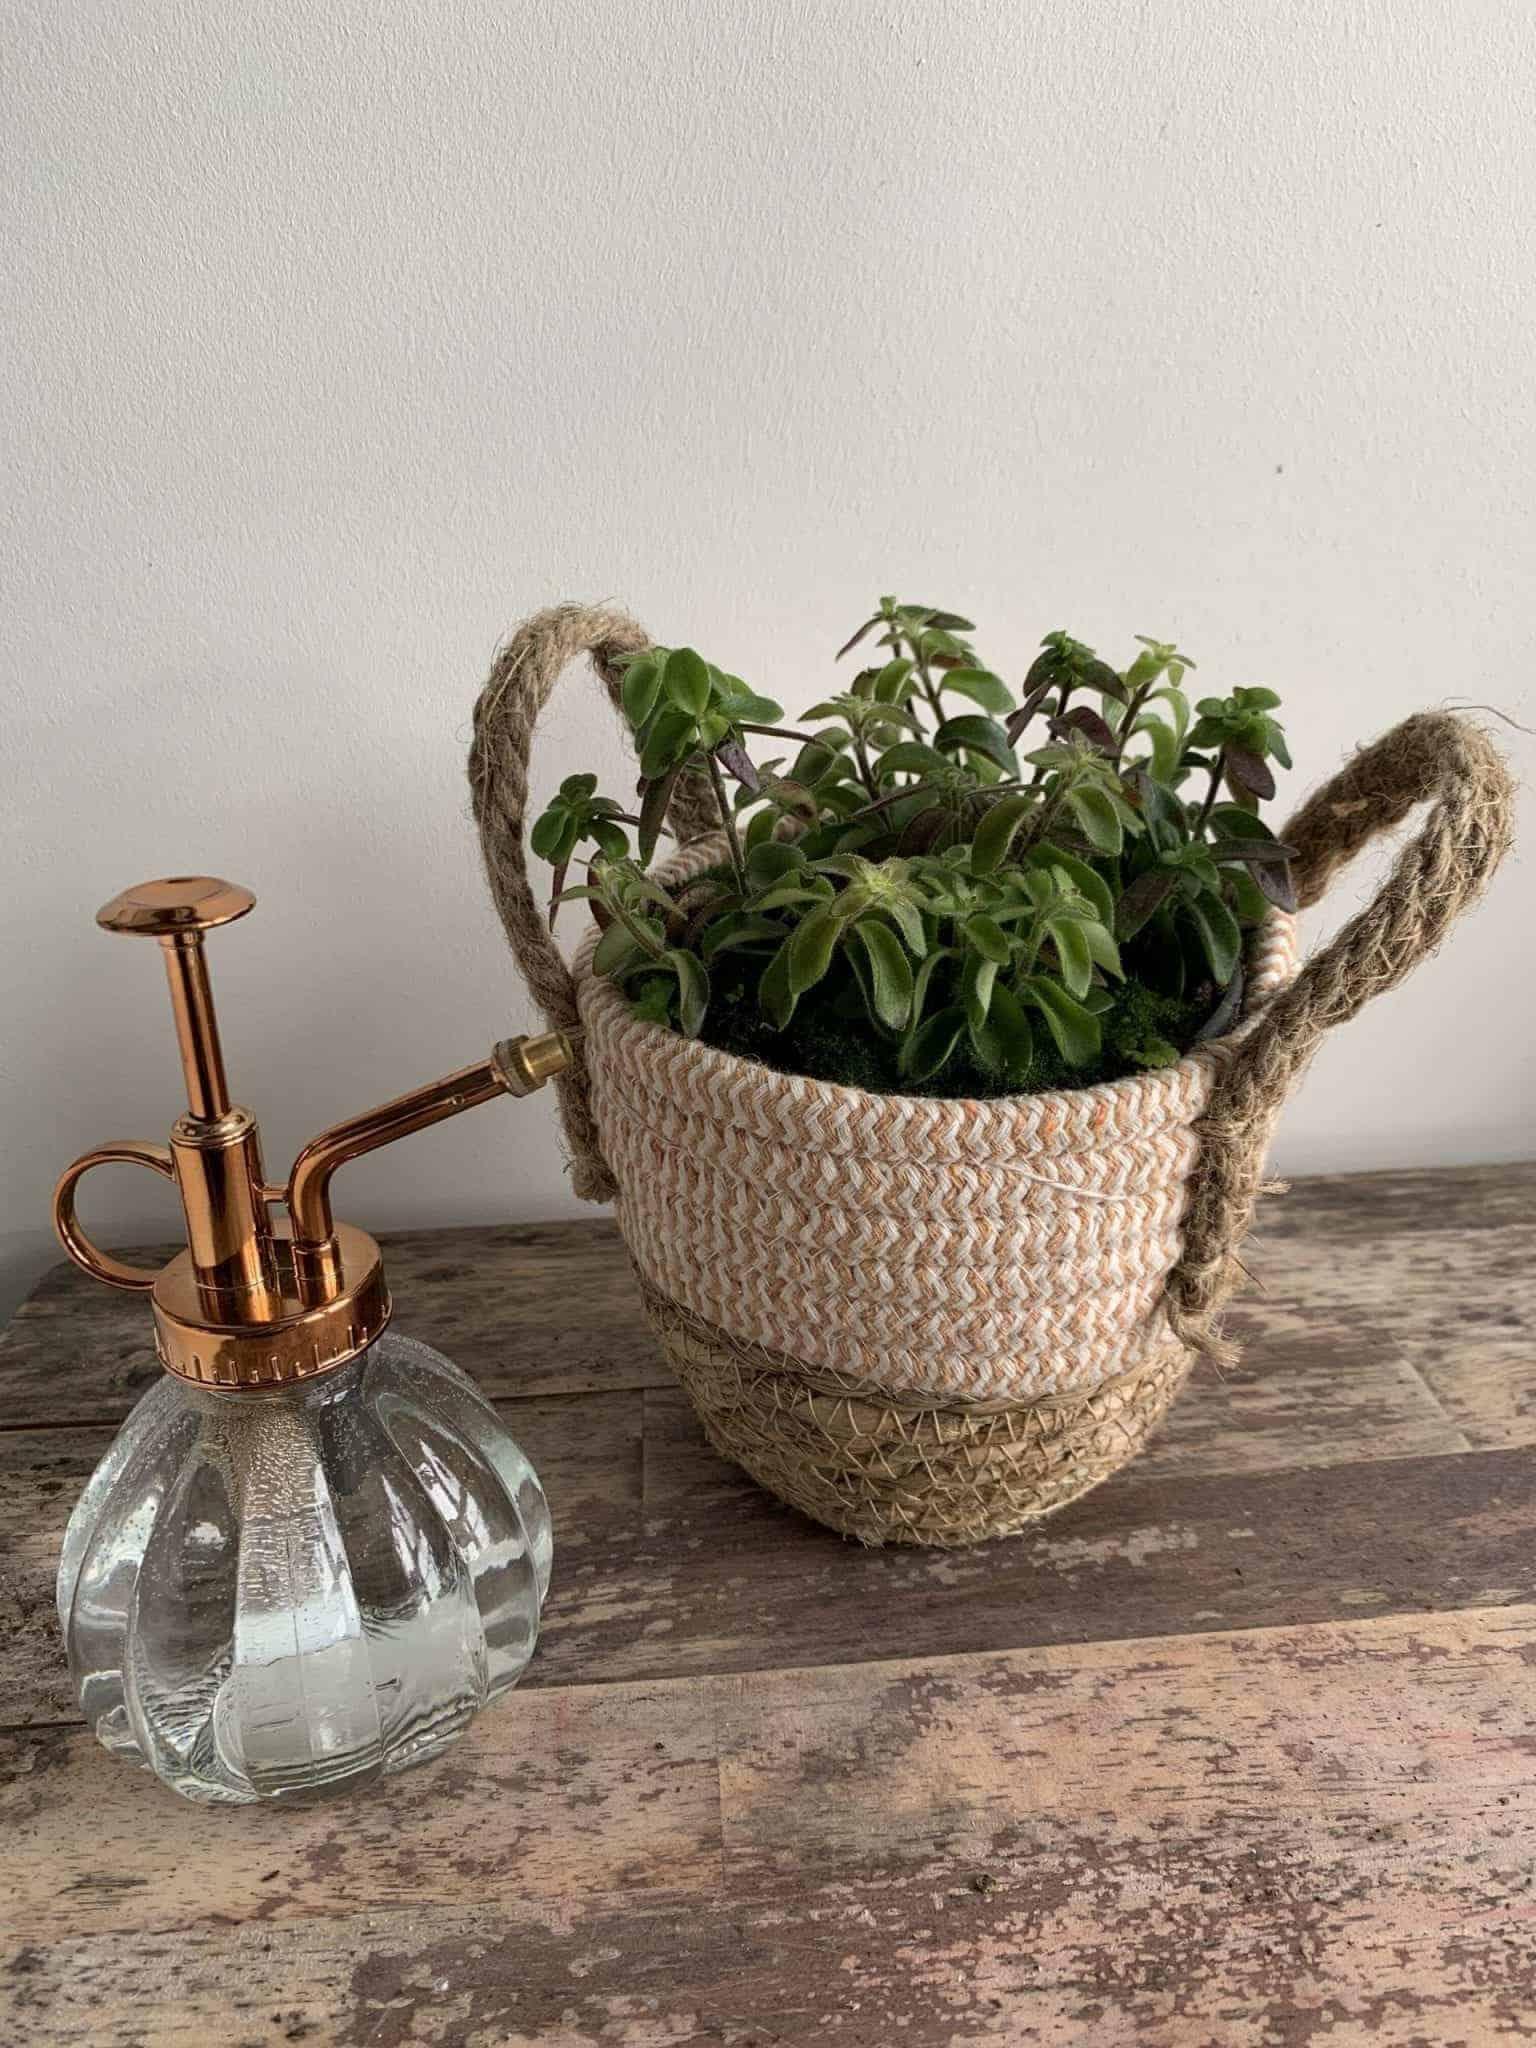 Aeschynanthus Twister Lipstick Plant in 14cm pot